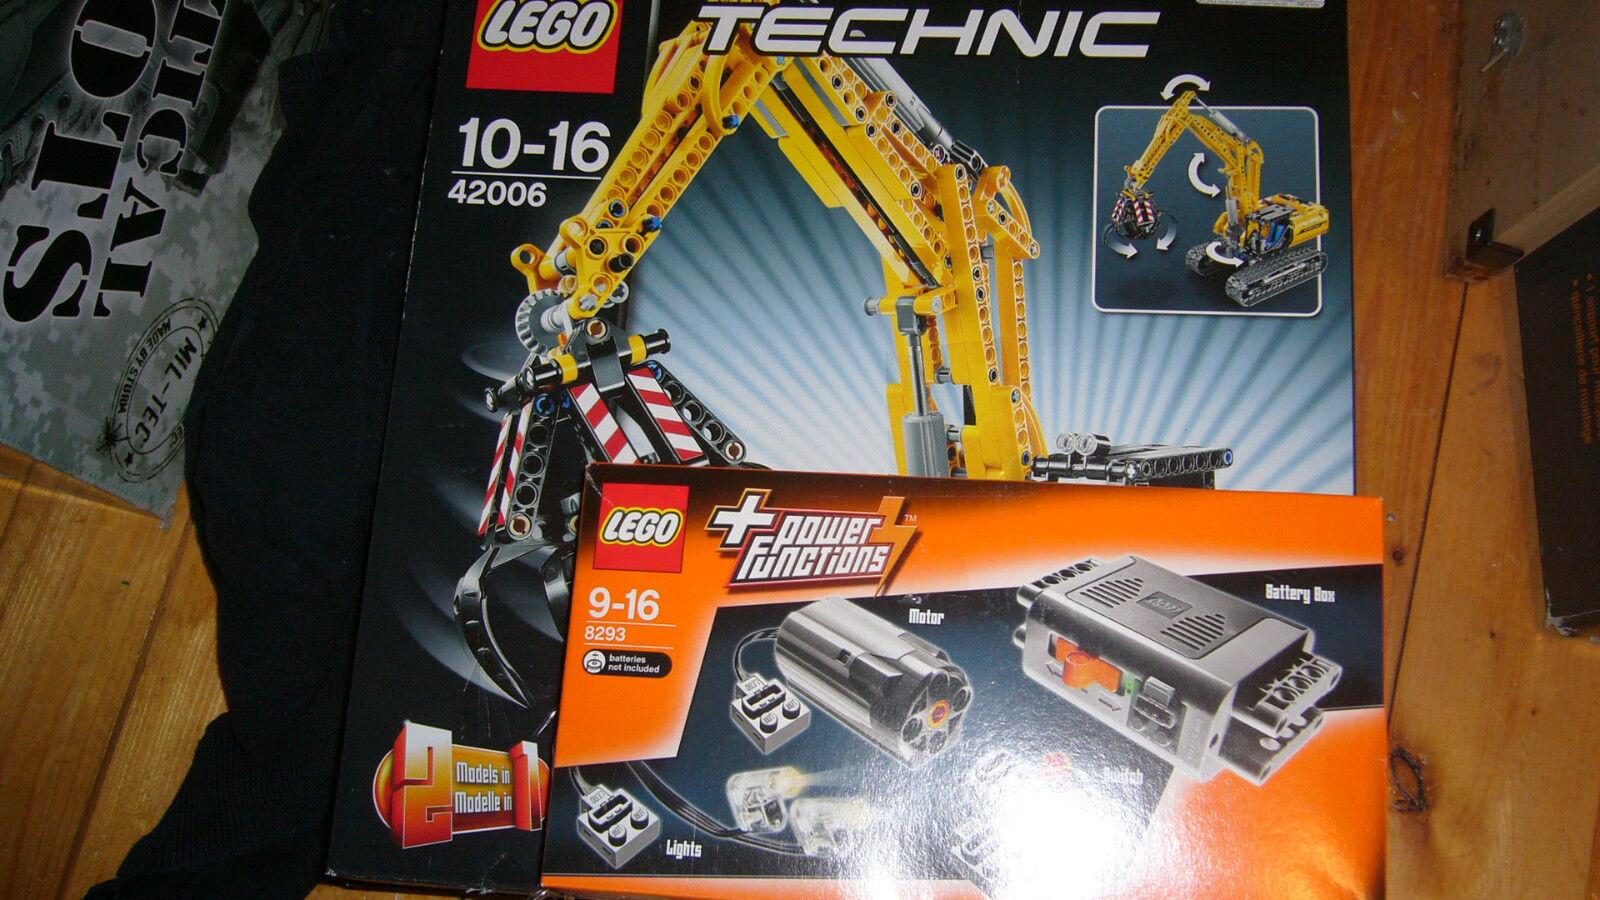 NEW LEGO Technic mobili pesanti gru 42009 tecnica CITY NUOVO Crawler Crane Top